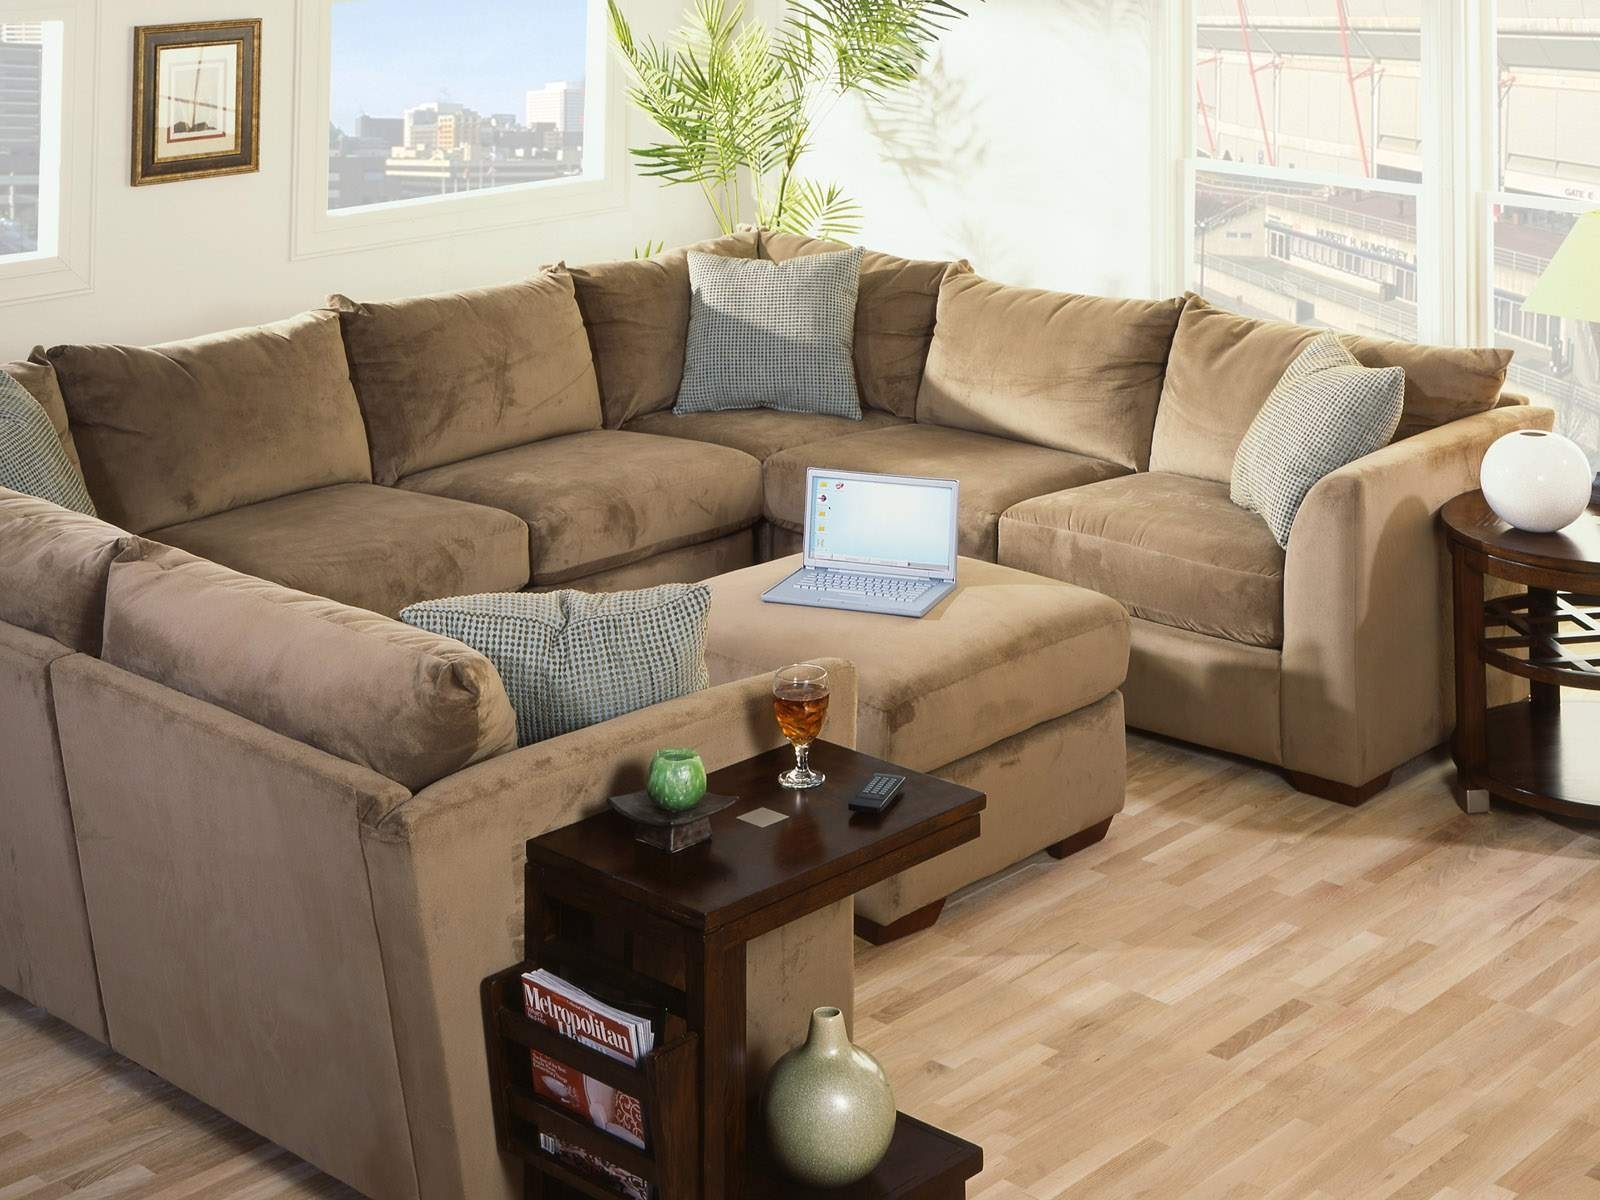 Furniture : Sectional Sofa Nailhead Trim Sectional Sofa Jamaica In Jamaica Sectional Sofas (Image 2 of 10)